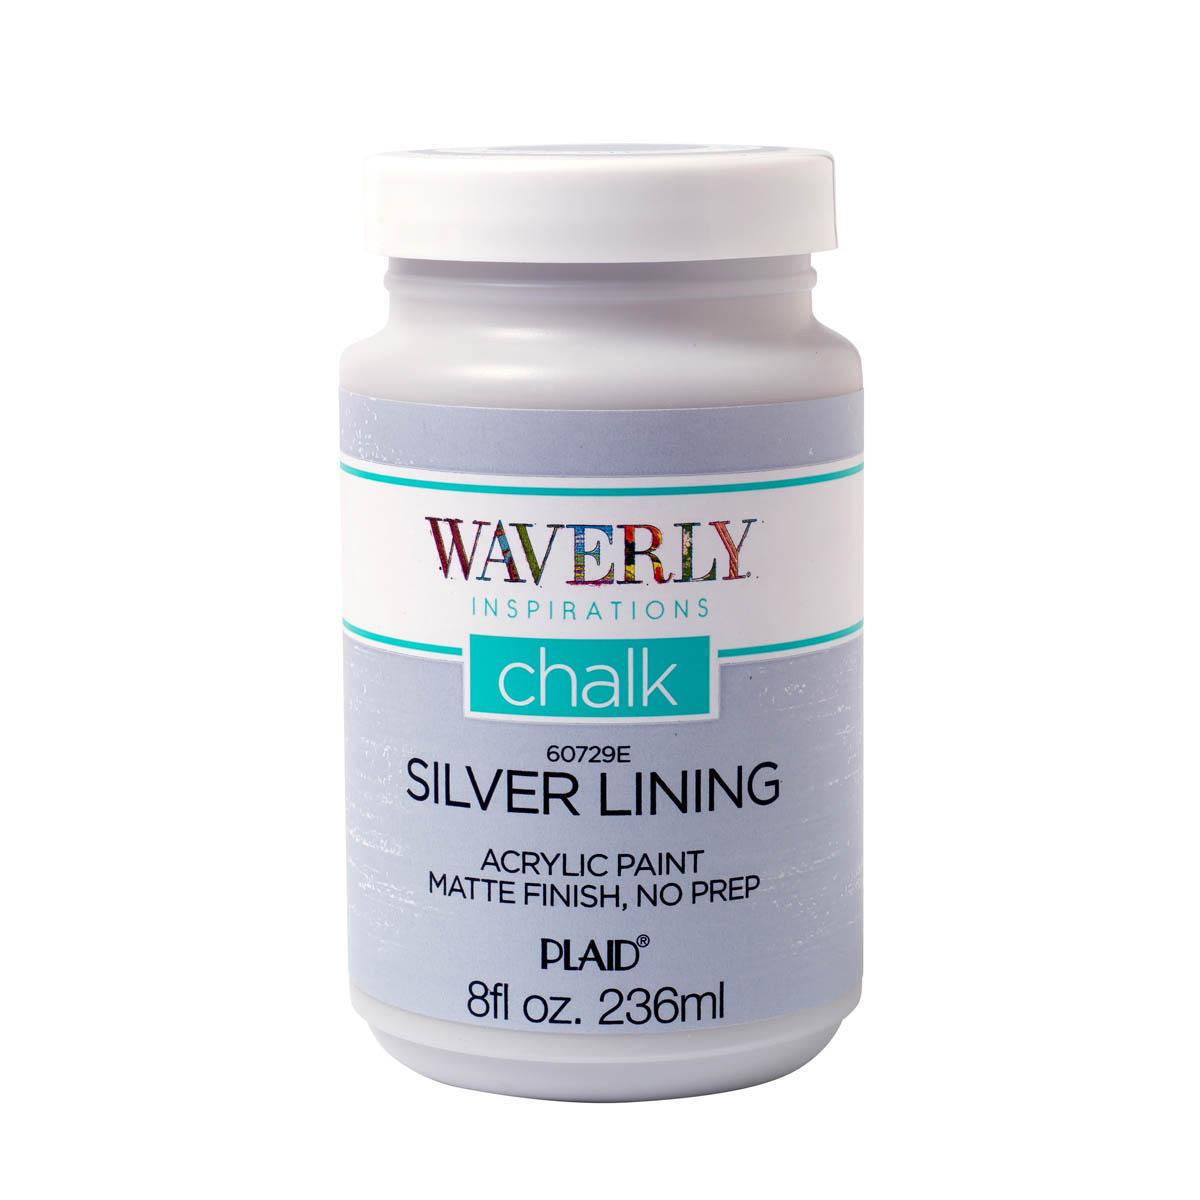 Waverly ® Inspirations Chalk Acrylic Paint - Silver Lining, 8 oz. - 60729E